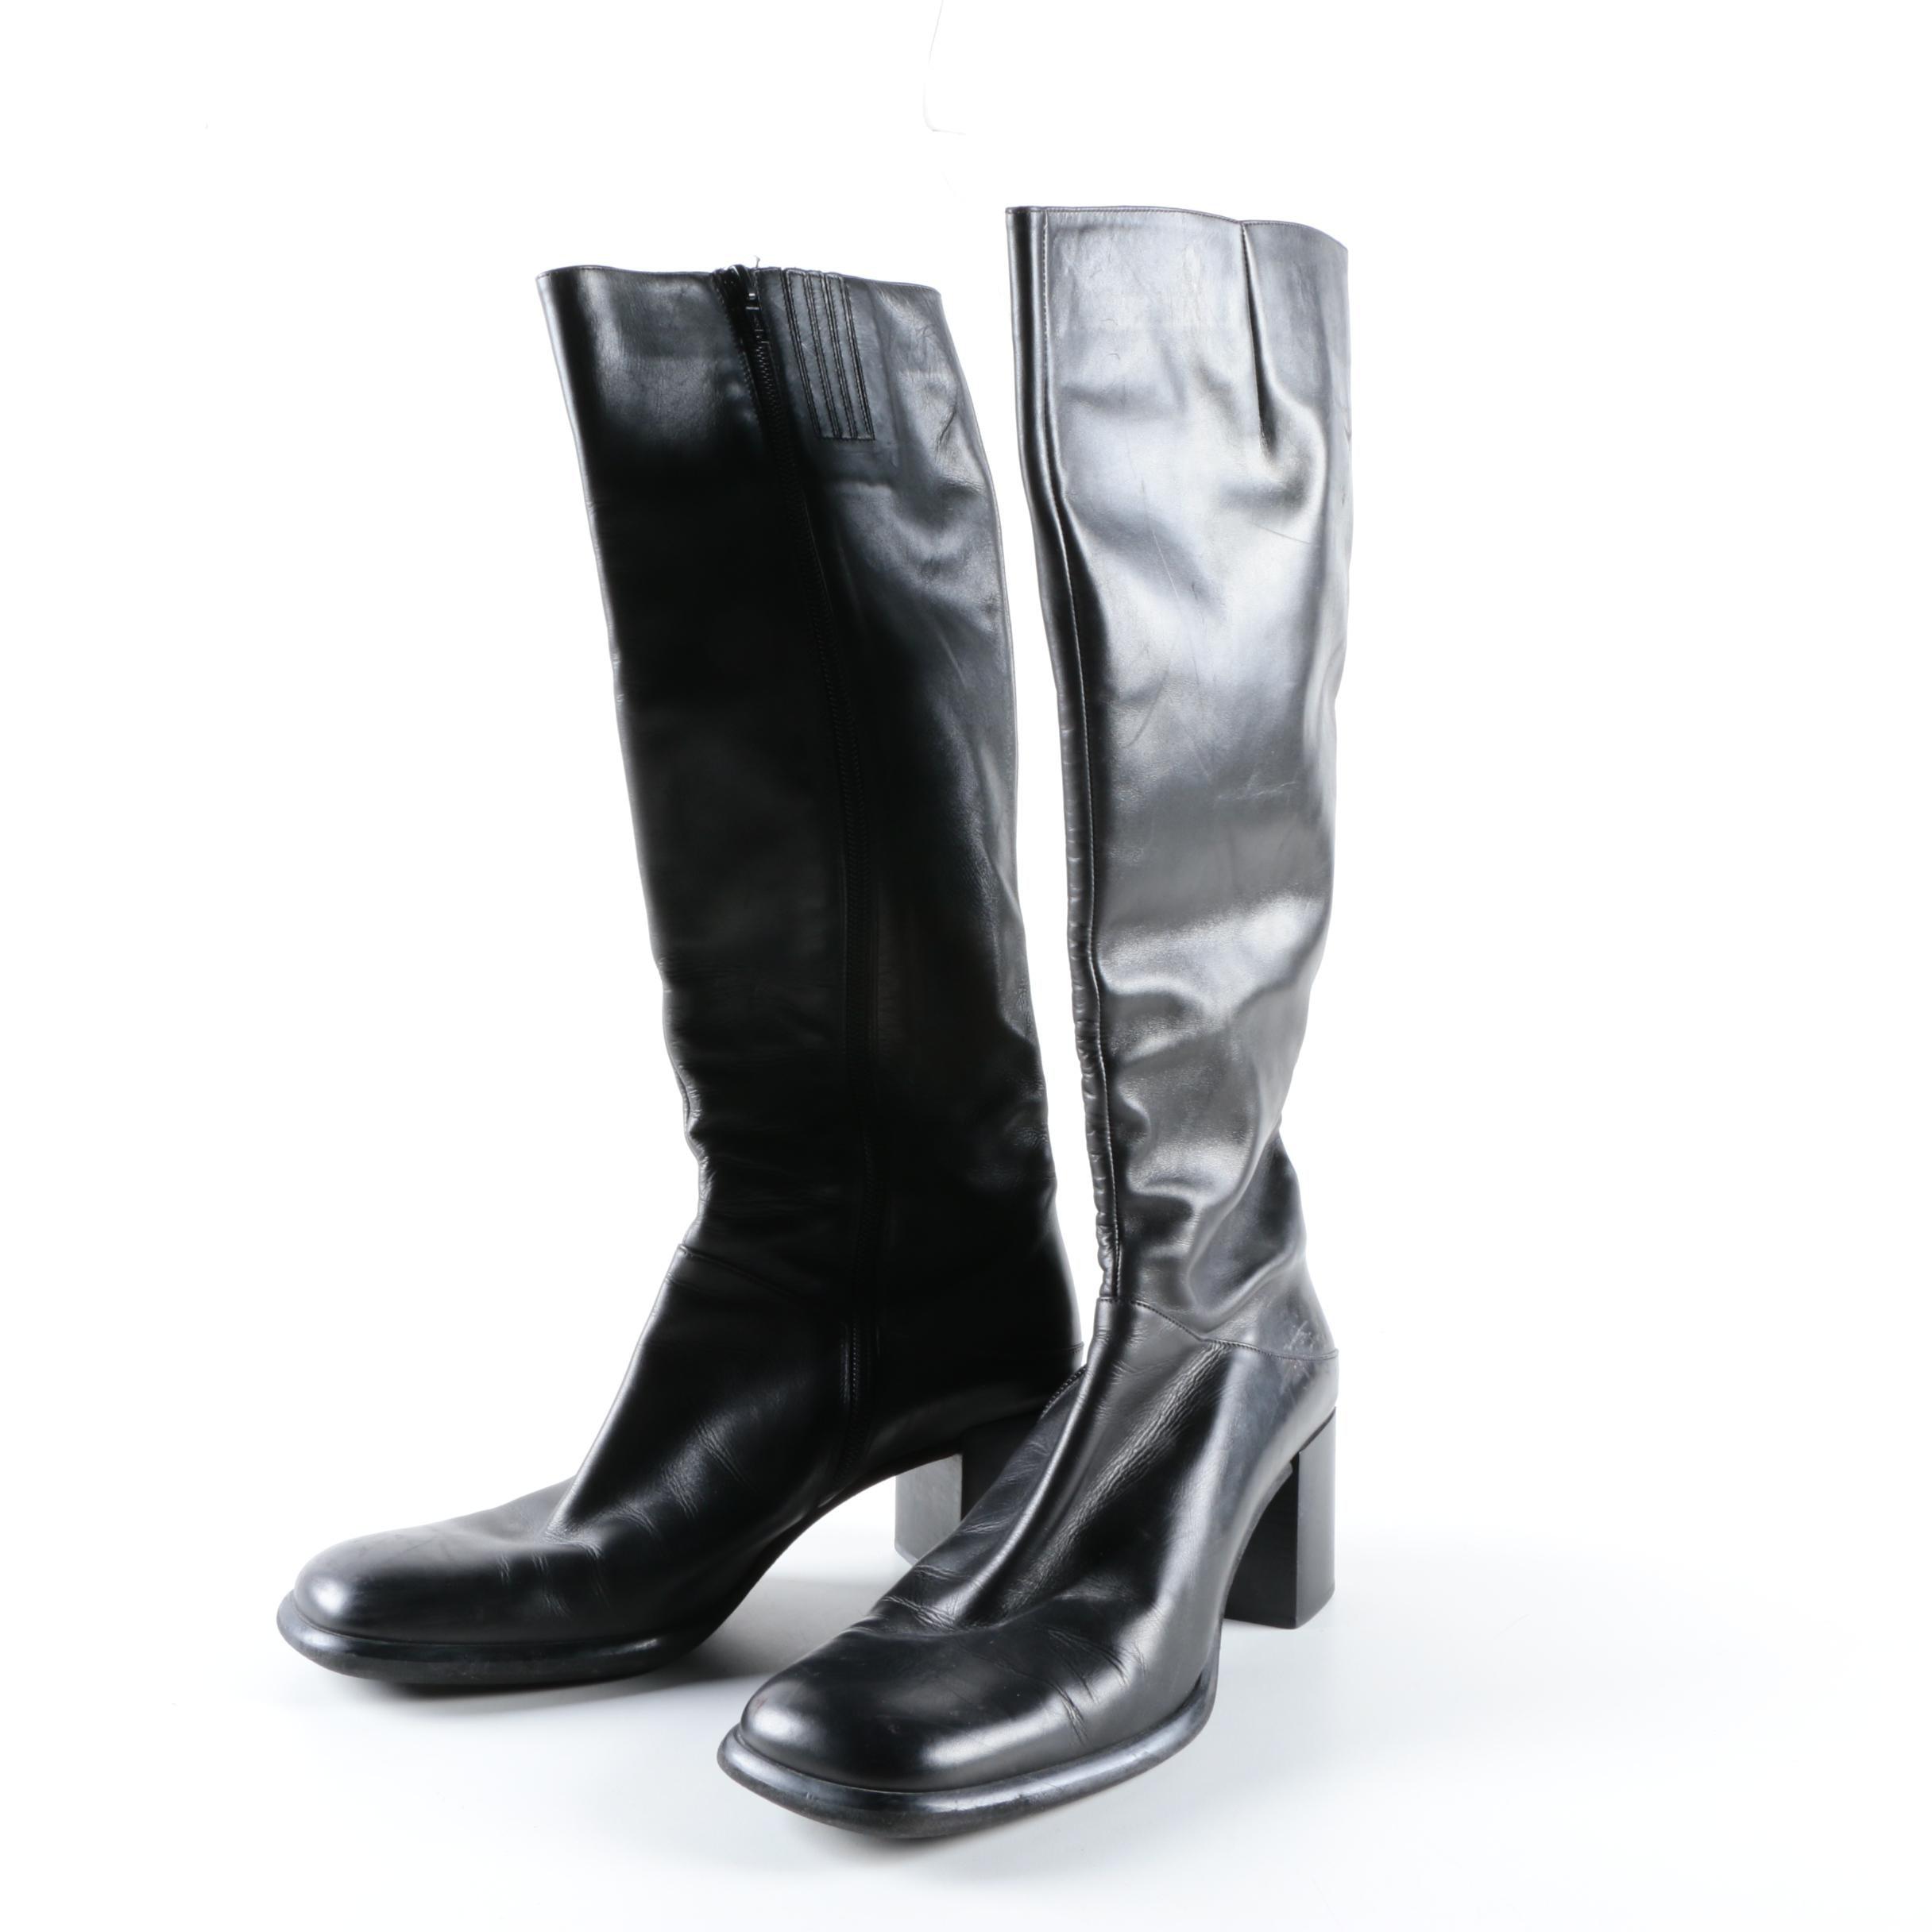 Women's Via Spiga Leather Boots